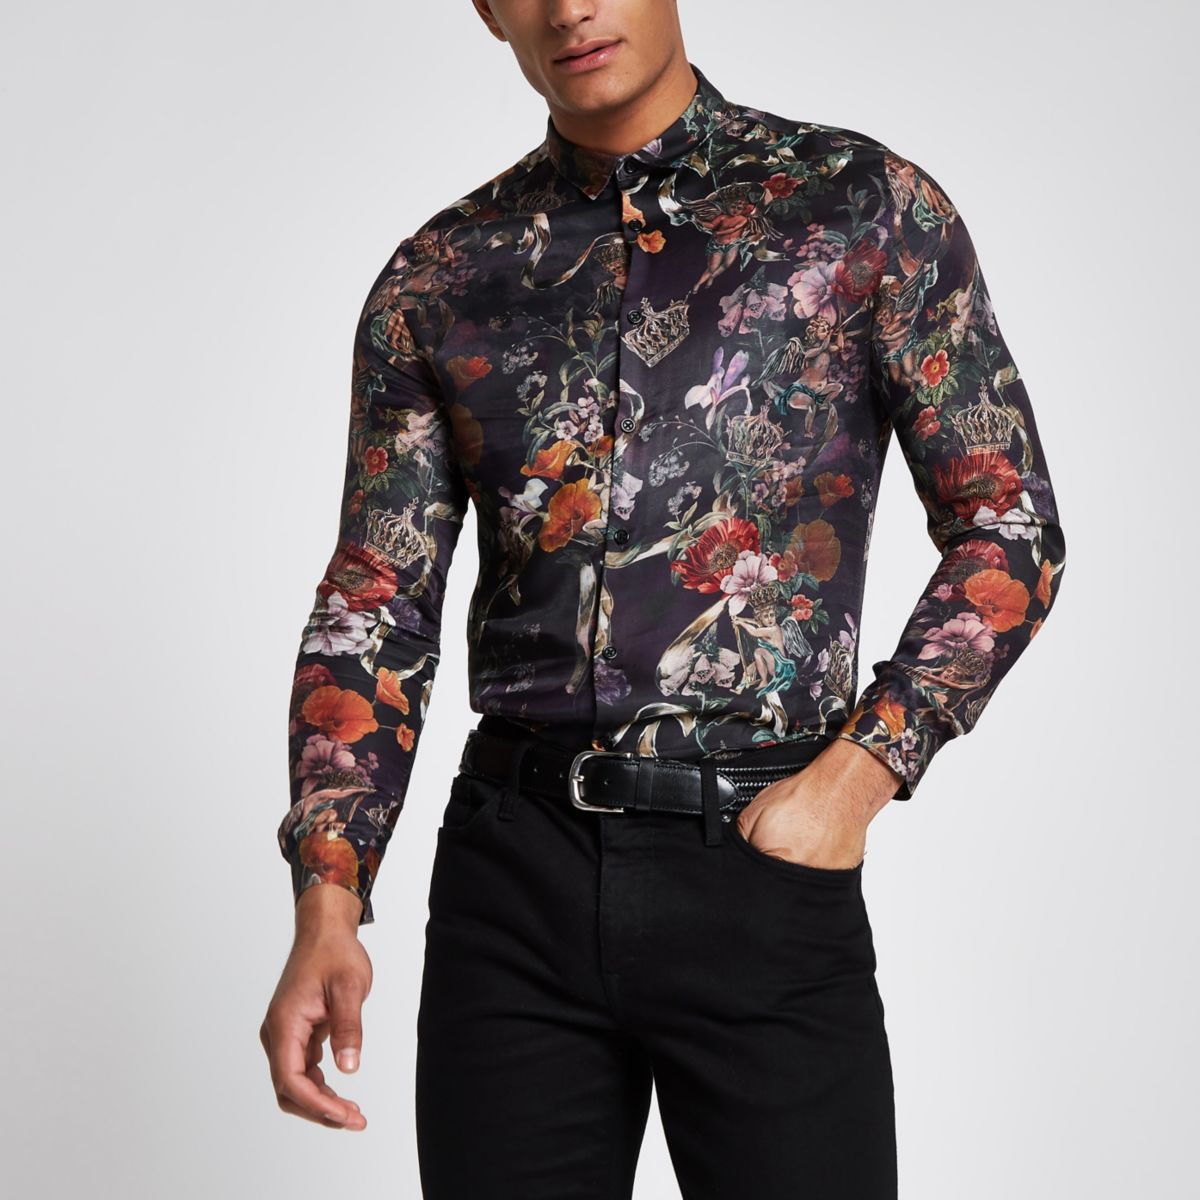 Black floral button-up shirt